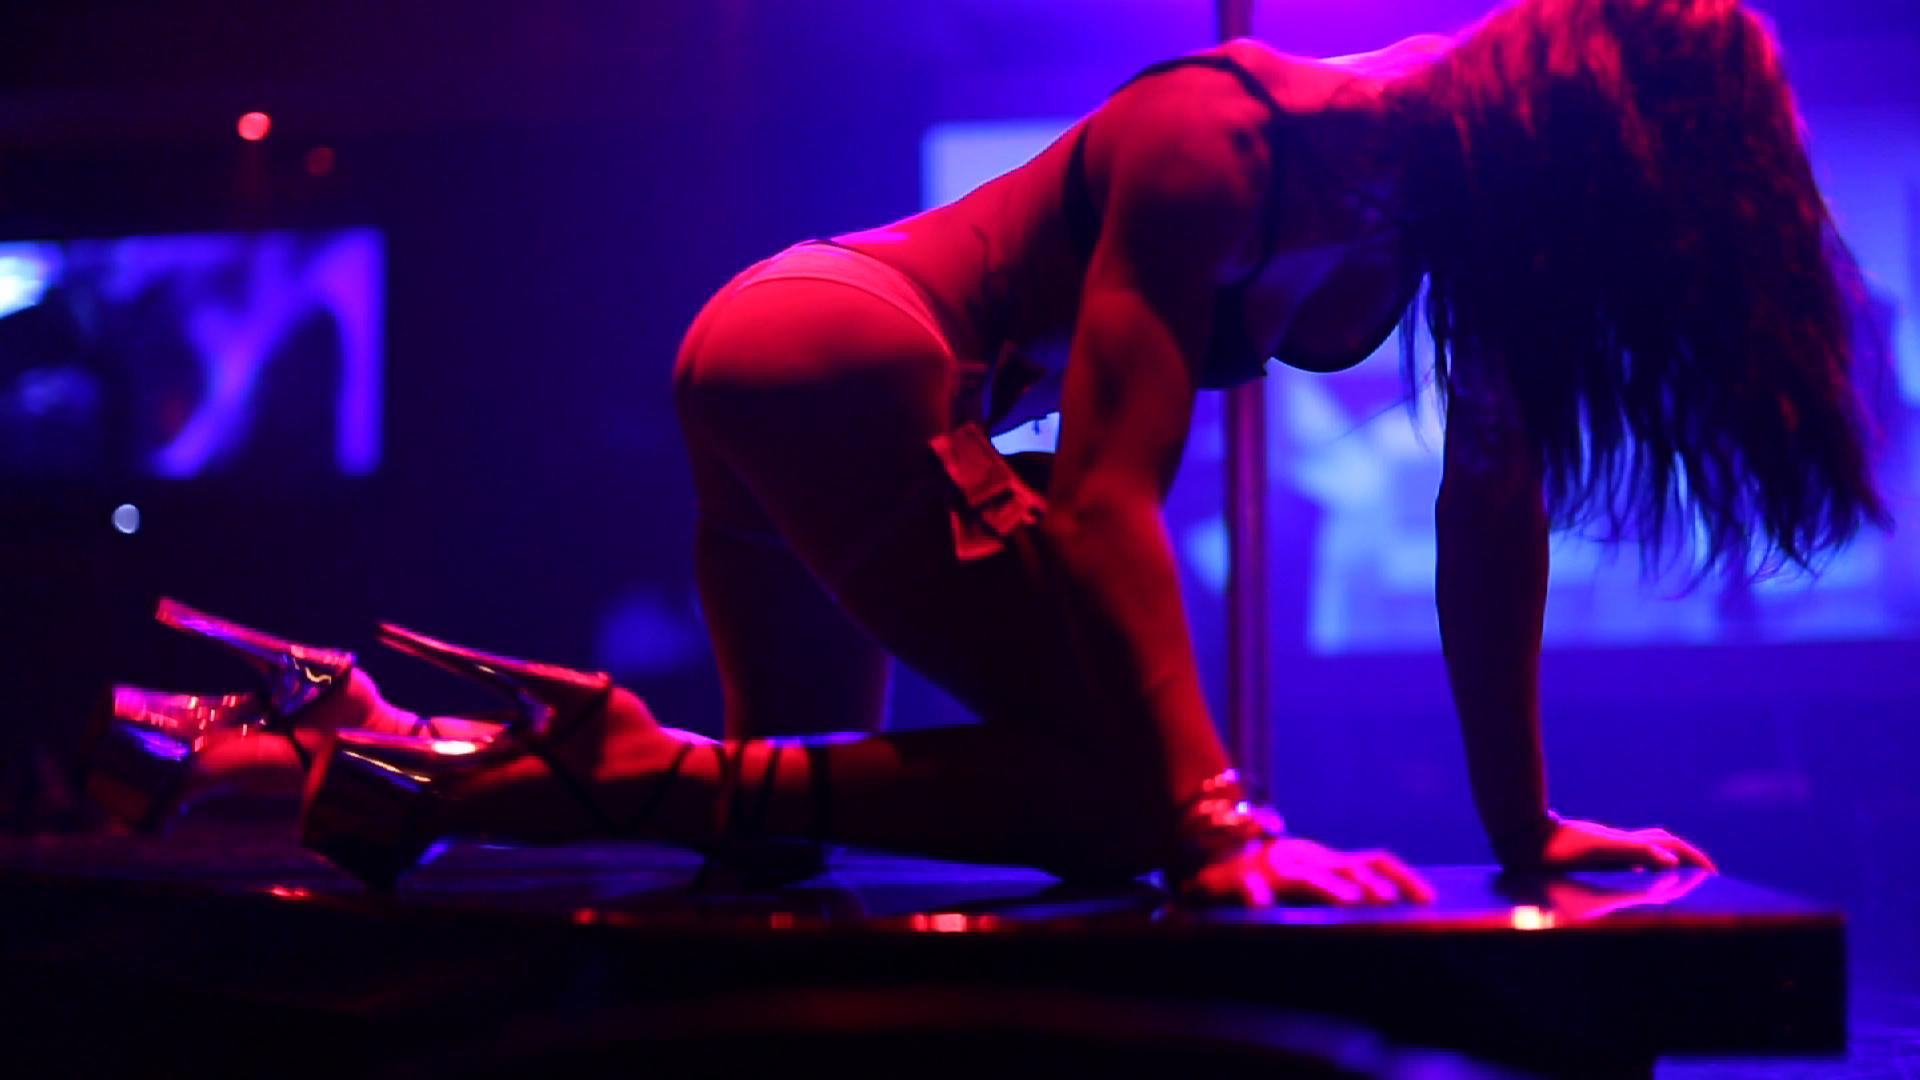 Watch strip club performance